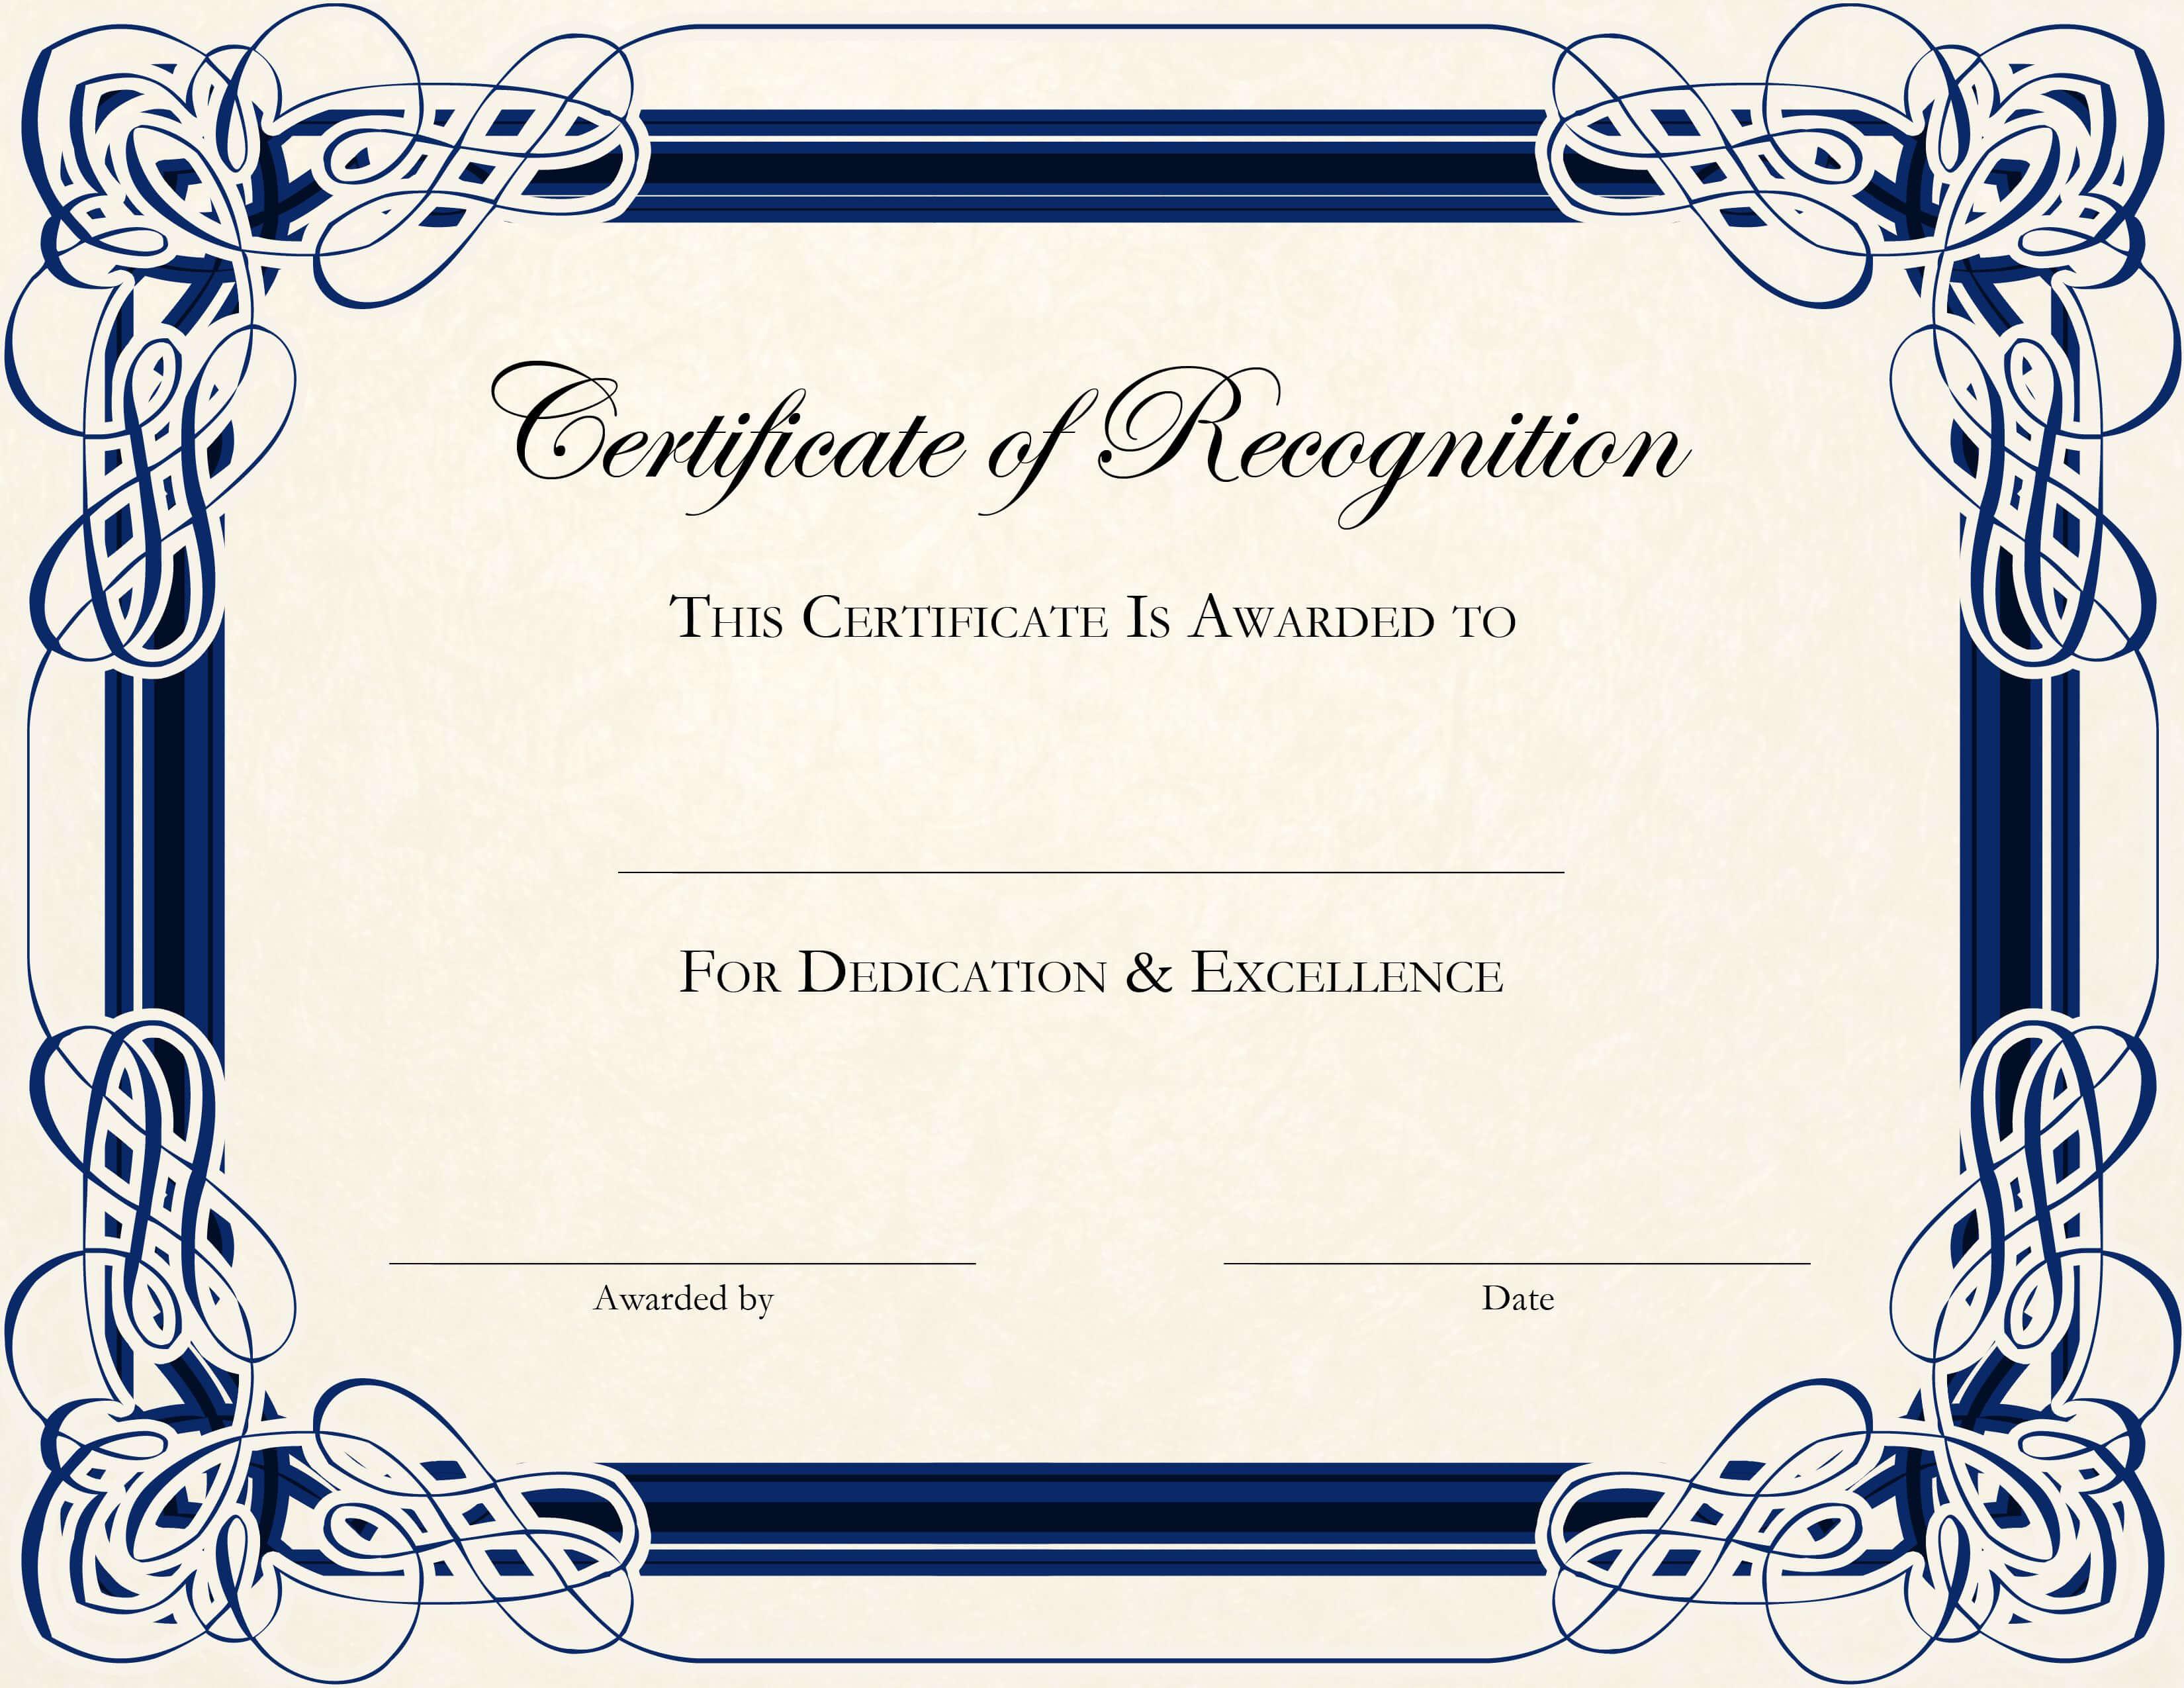 Certificate Template Designs Recognition Docs | Certificate In Sample Certificate Of Recognition Template